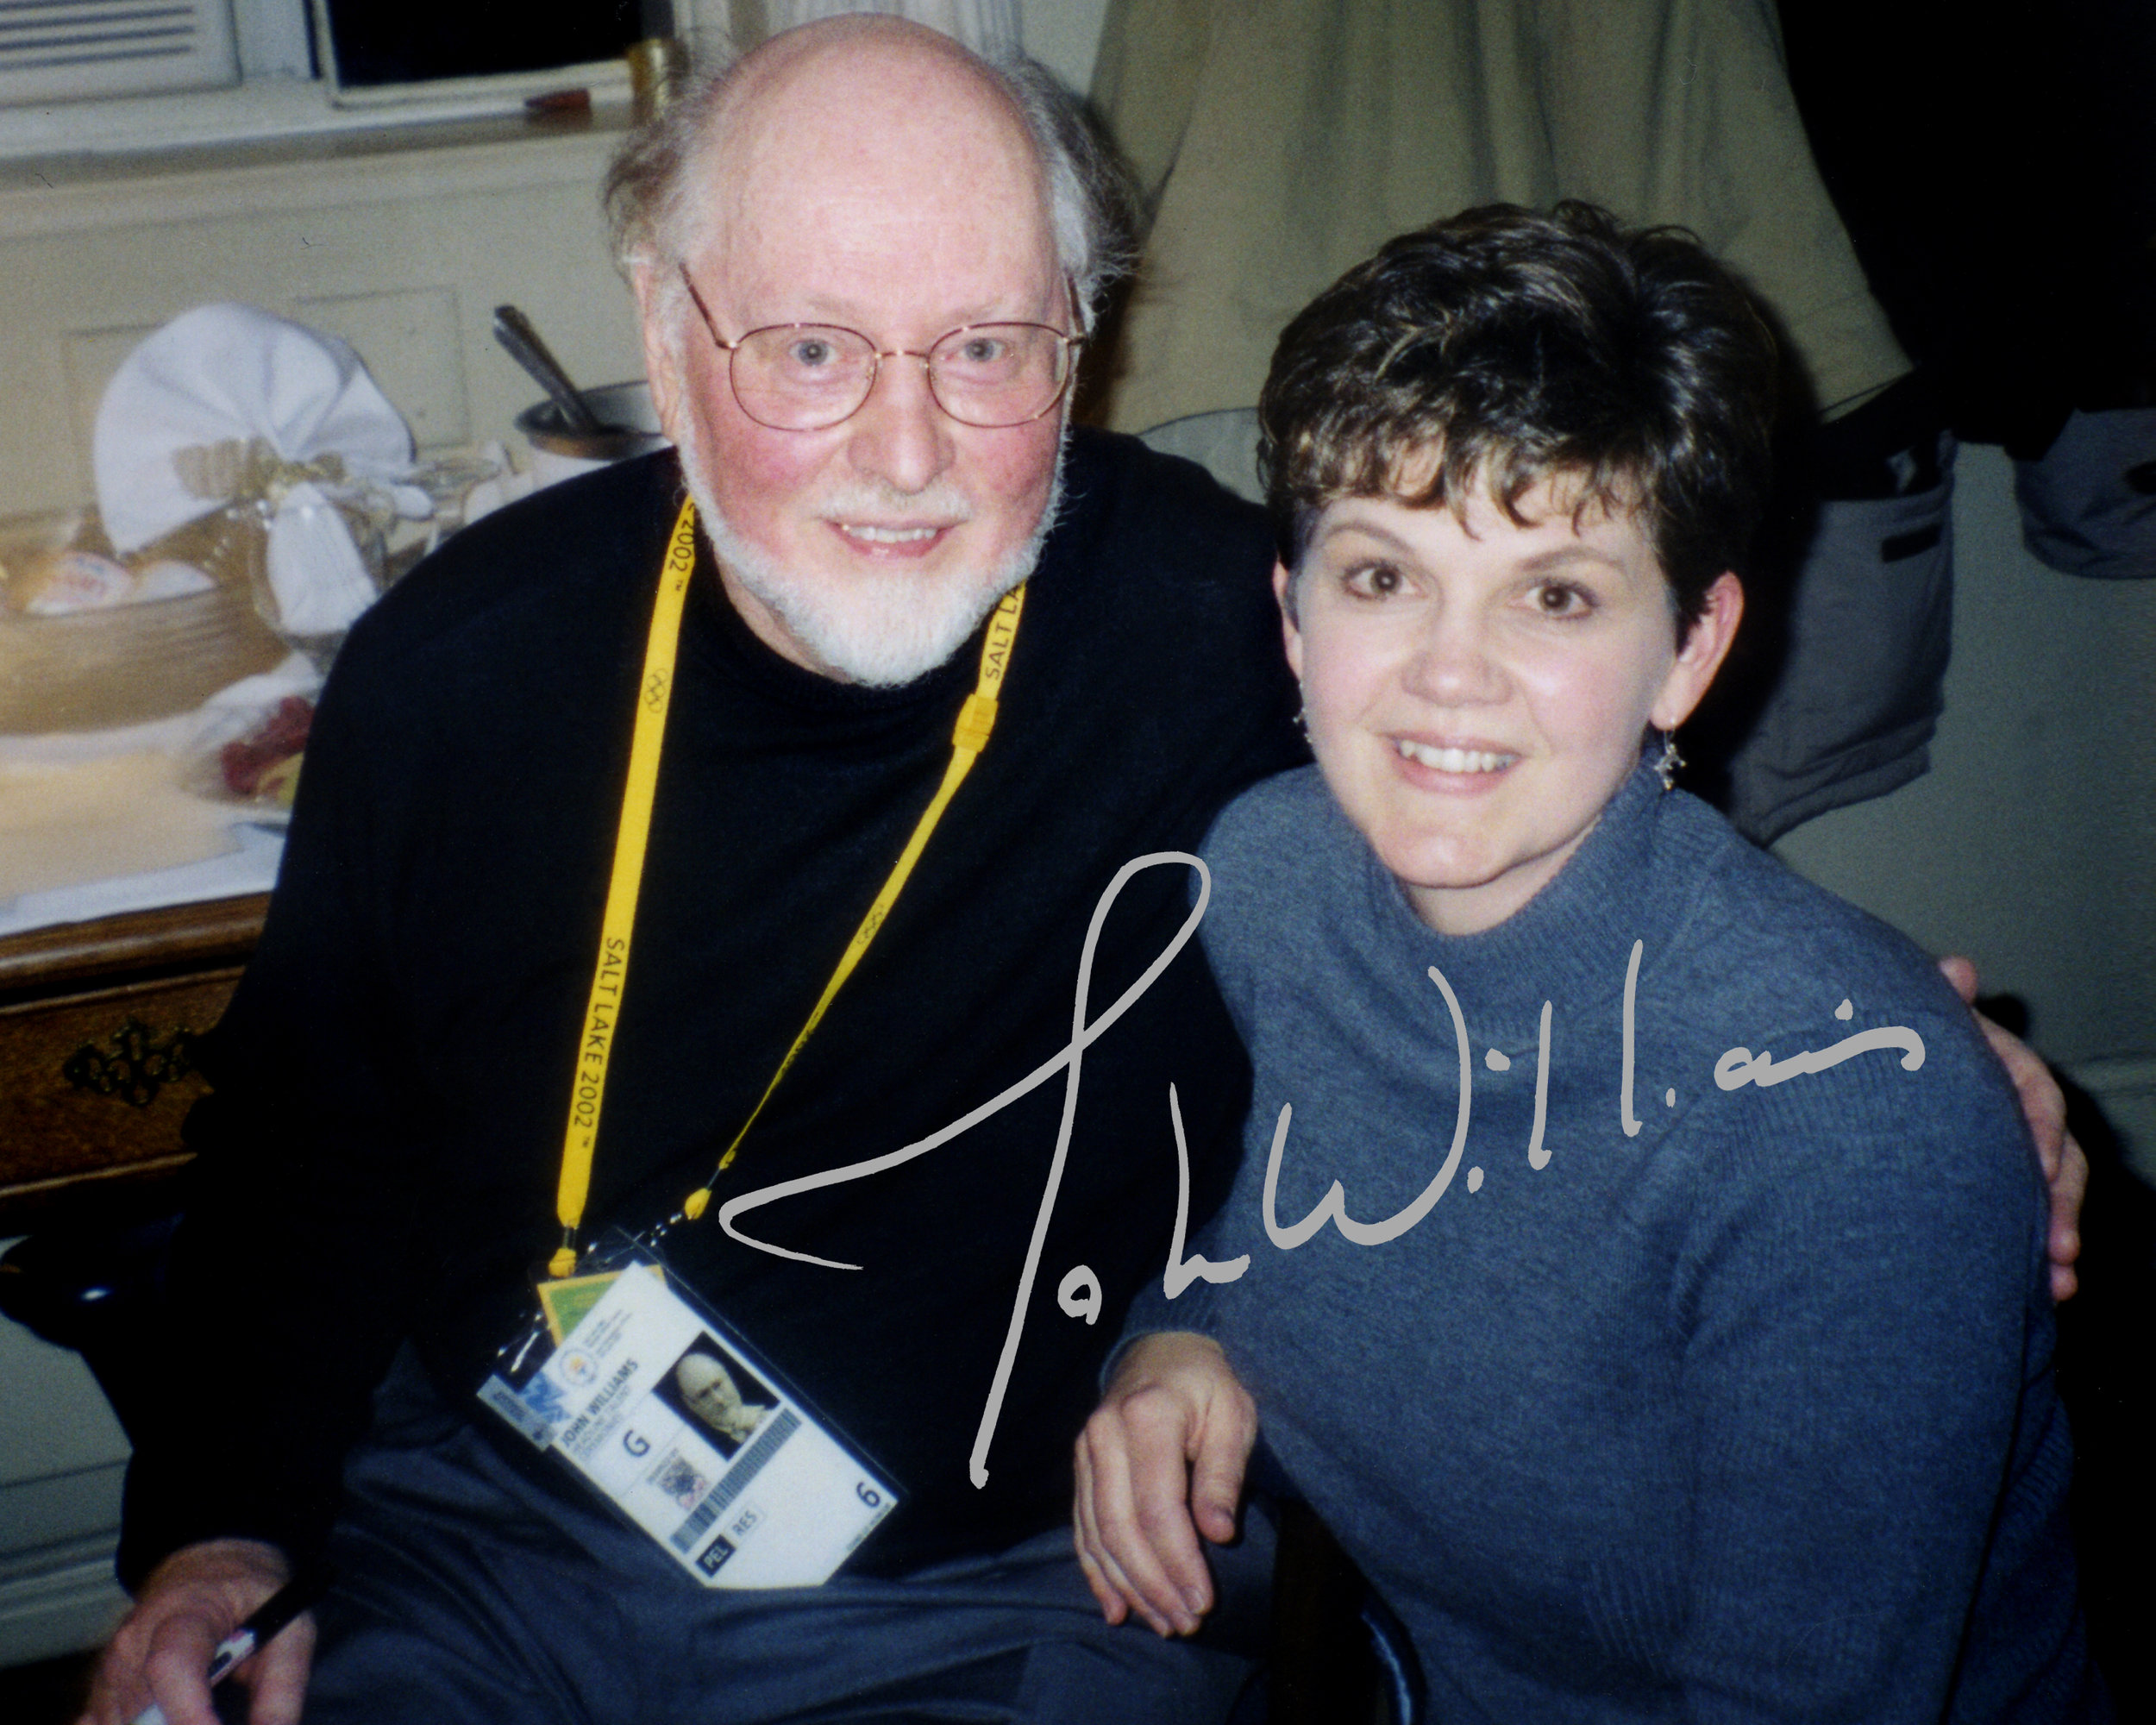 Jeannine Goeckeritz - John Williams - 2002 Winter Olympics Performances